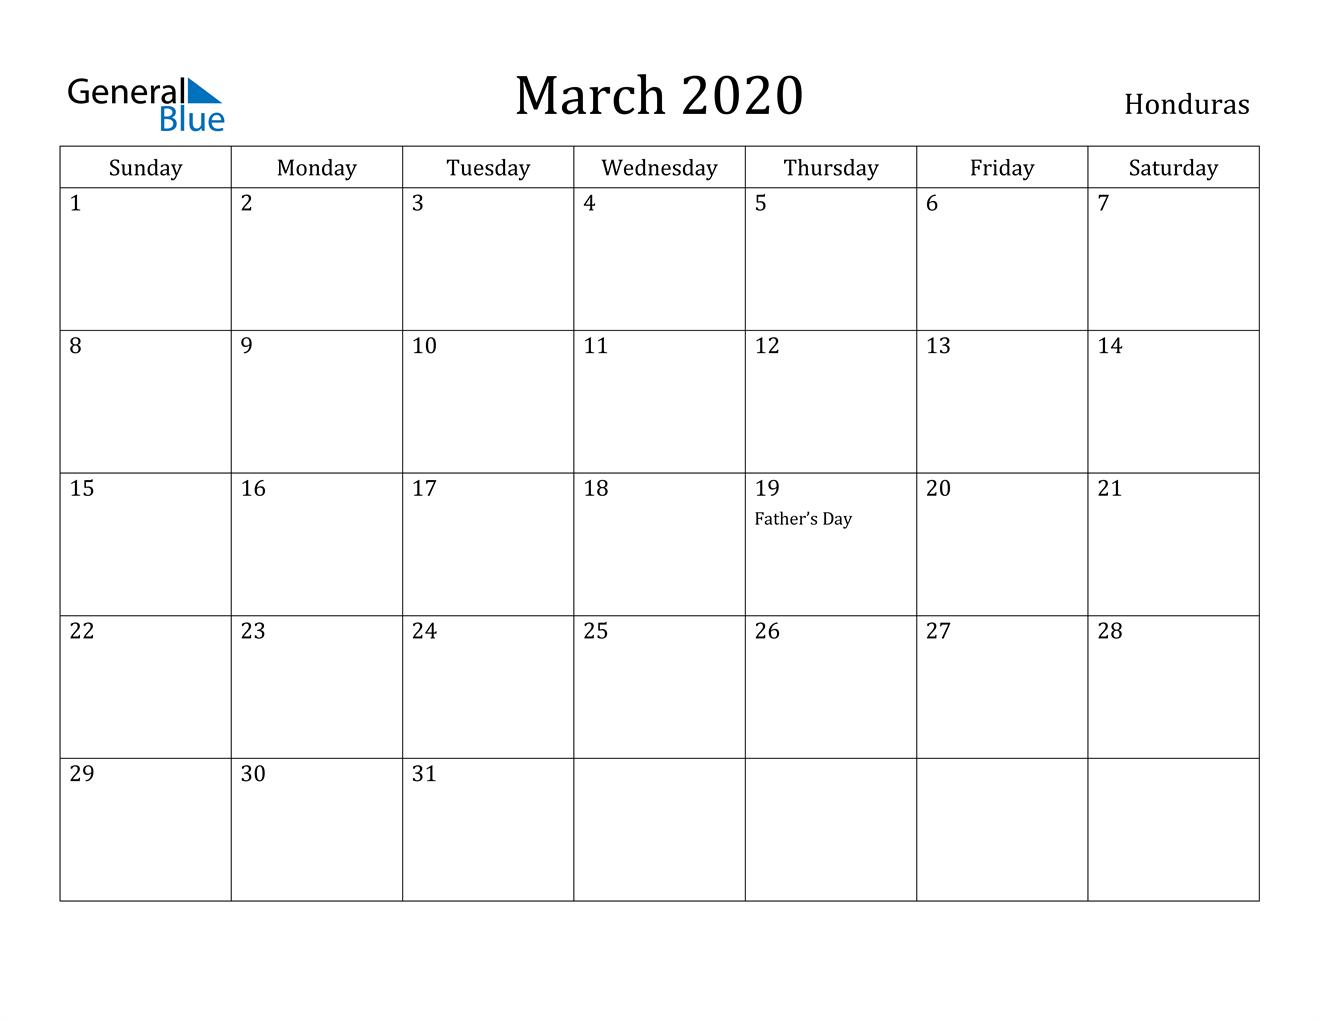 Image of March 2020 Honduras Calendar with Holidays Calendar